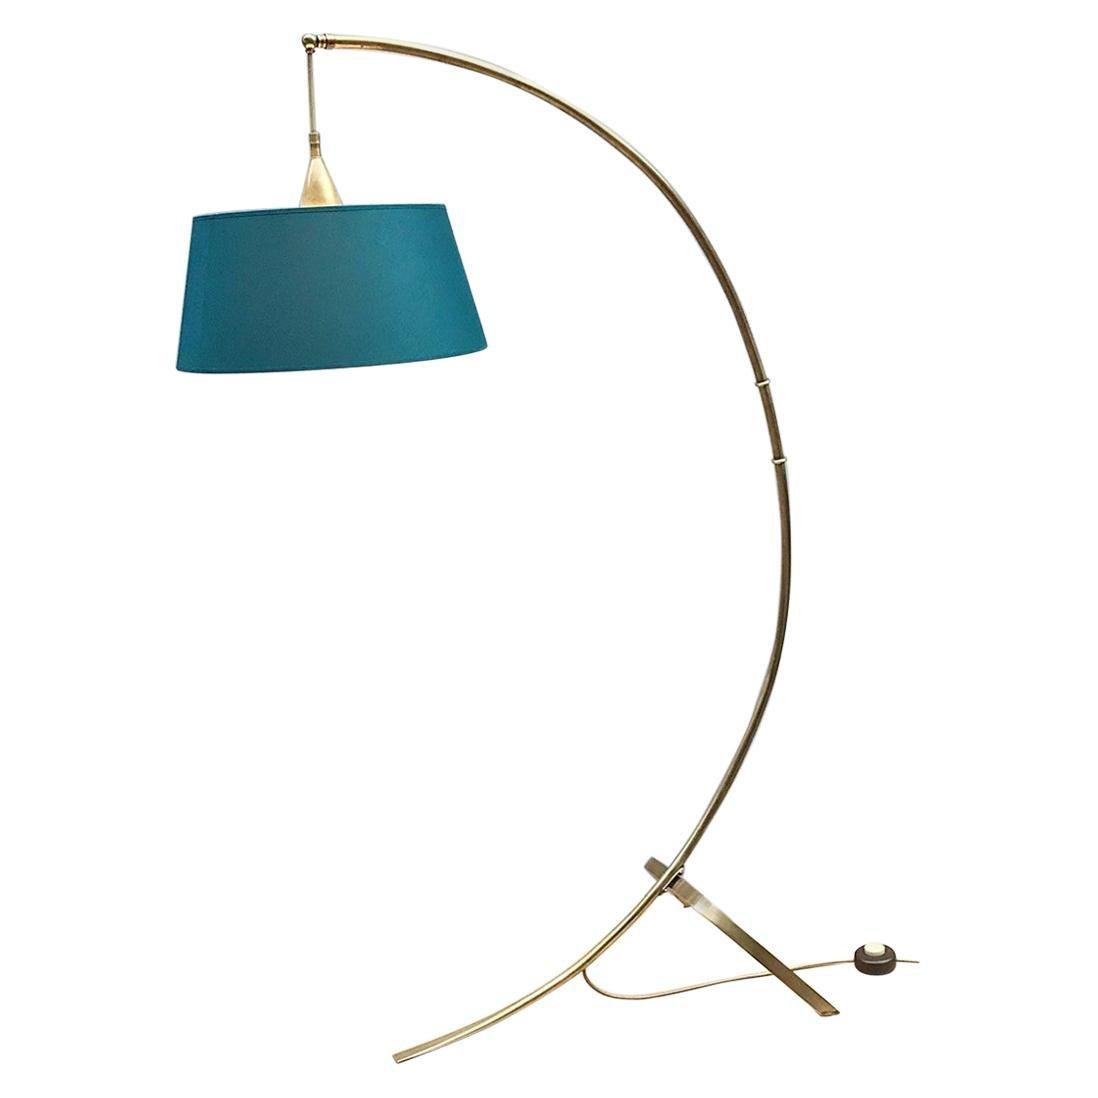 Brass Arc Floor Lamp by J. T. Kalmar for Kalmar, 1950s, New Lampshade